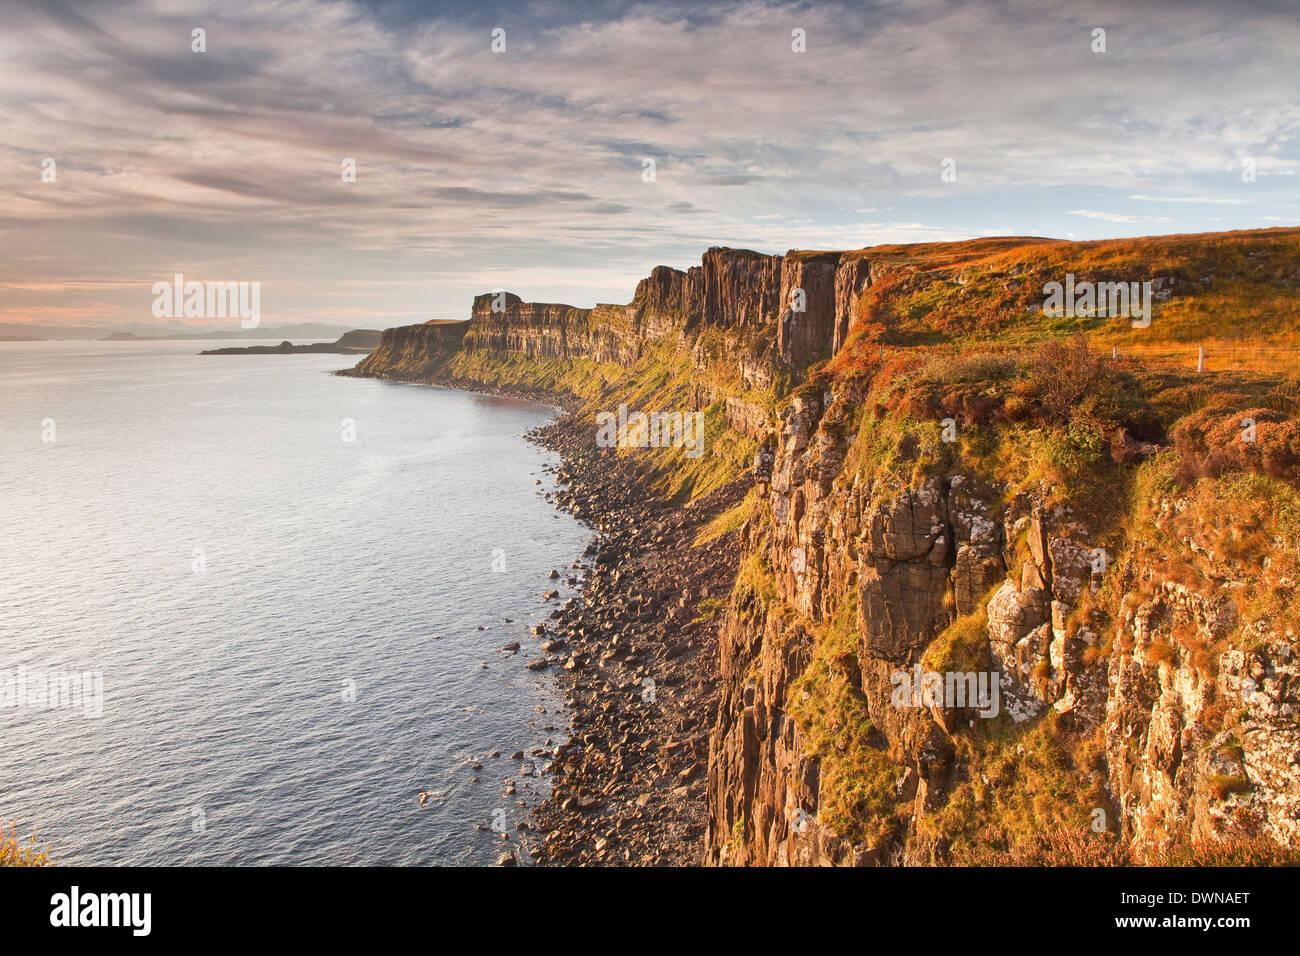 Basaltic cliffs facing onto Raasay Sound, east coast of Skye, Trotternish, Isle of Skye, Inner Hebrides, Scotland, UK - Stock Image